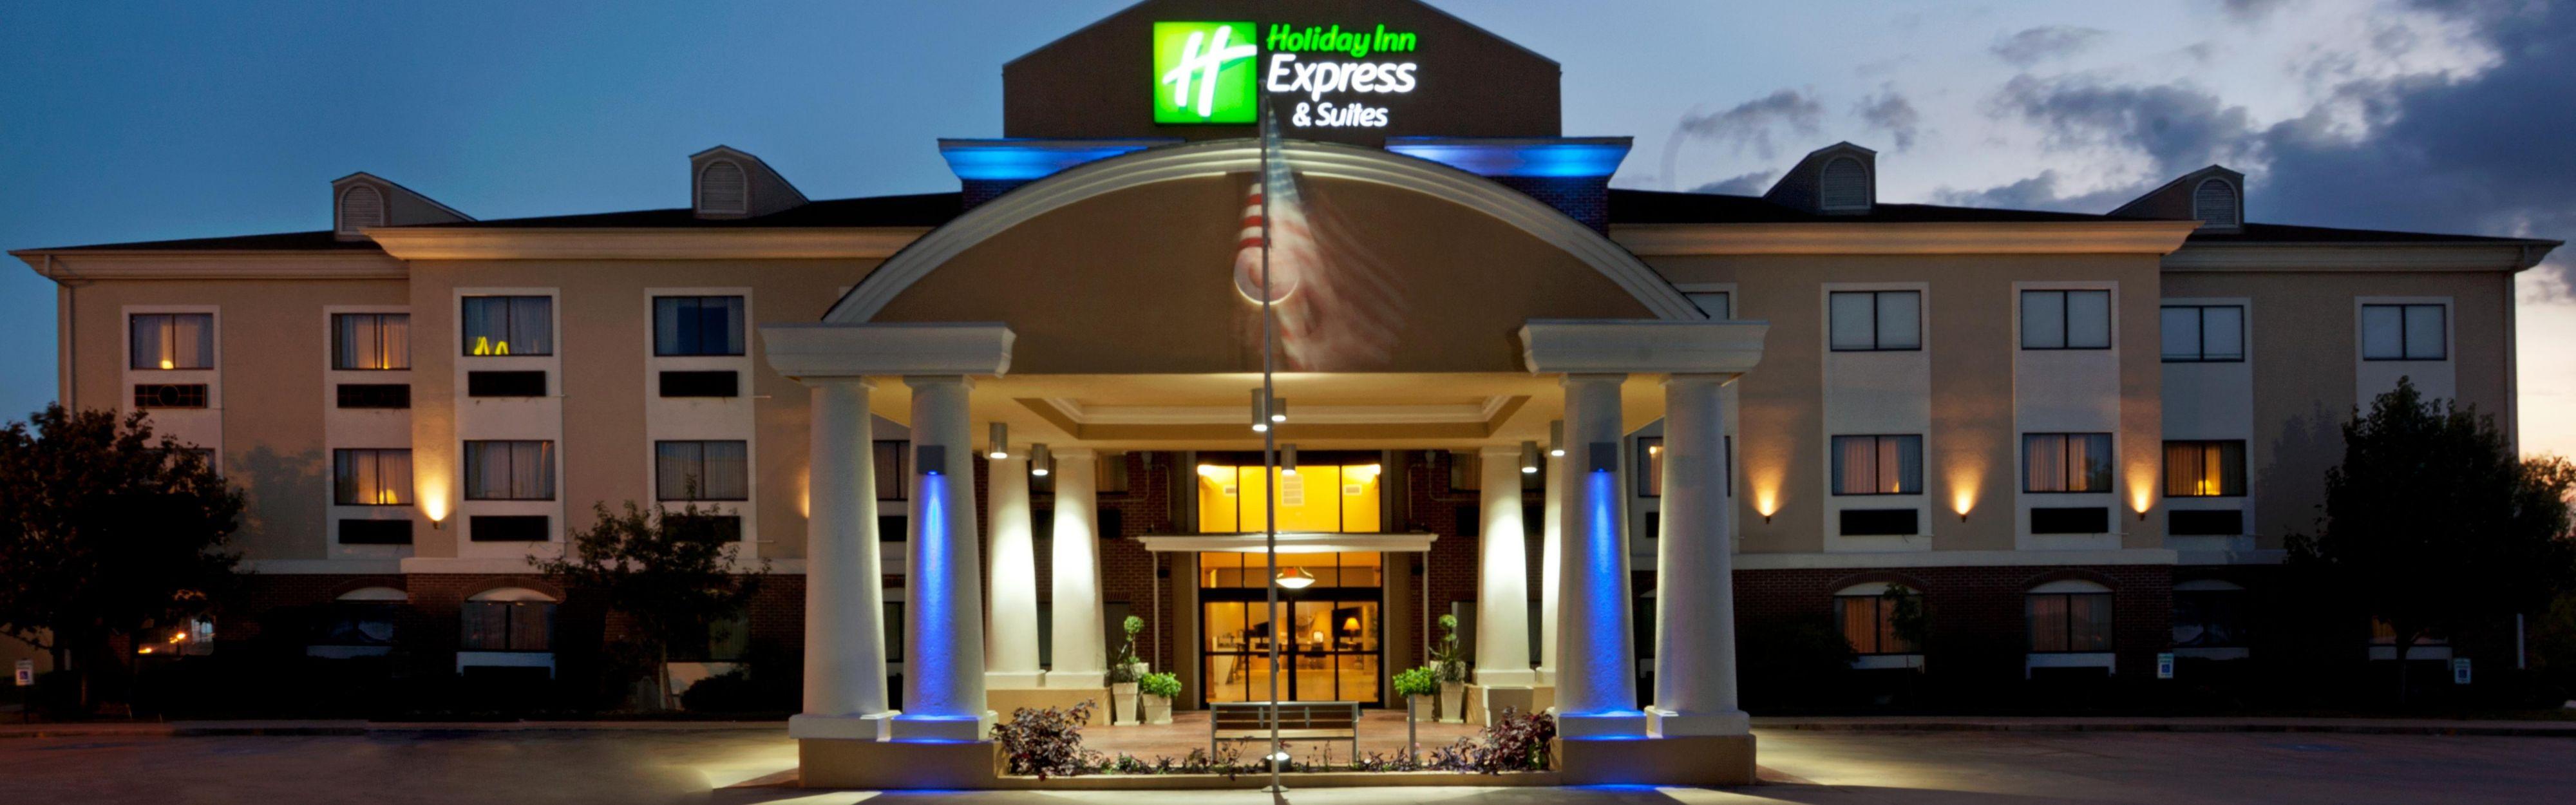 Holiday Inn Express & Suites Elgin image 0